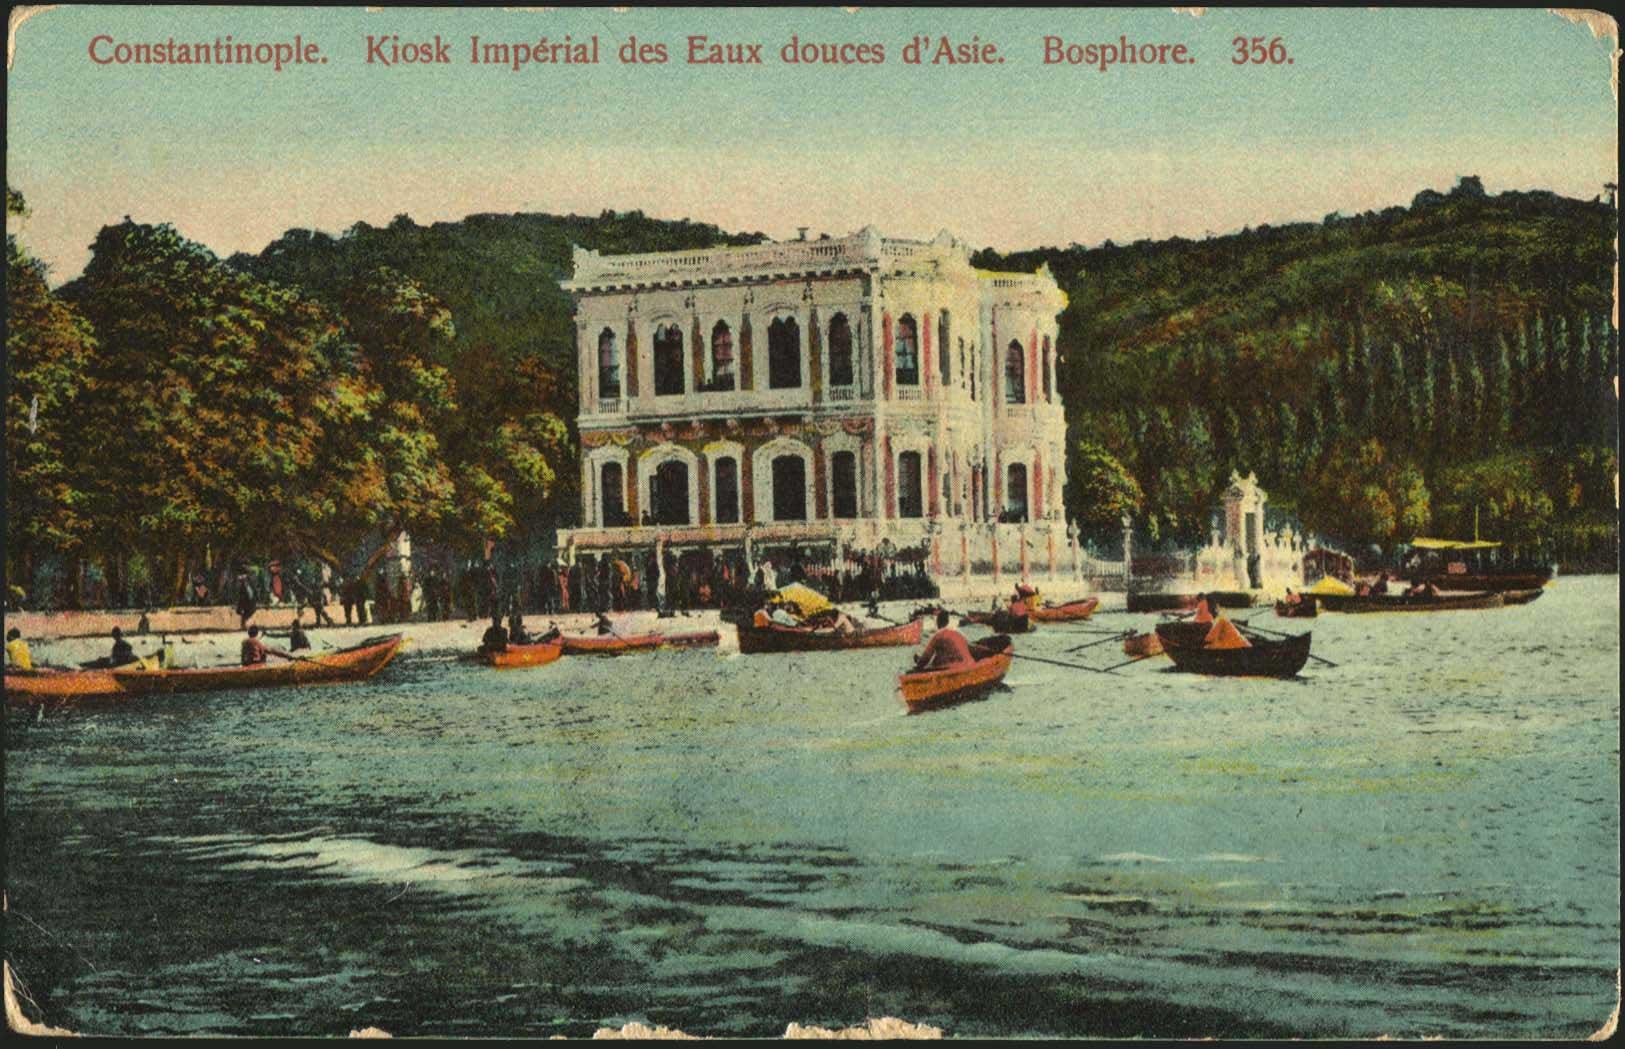 Lot 1567 - -  PICTURE POSTCARDS SMYRNE, CONSTANTINOPLE, ASIA MINOR -  A. Karamitsos Public & Live Internet Auction 683